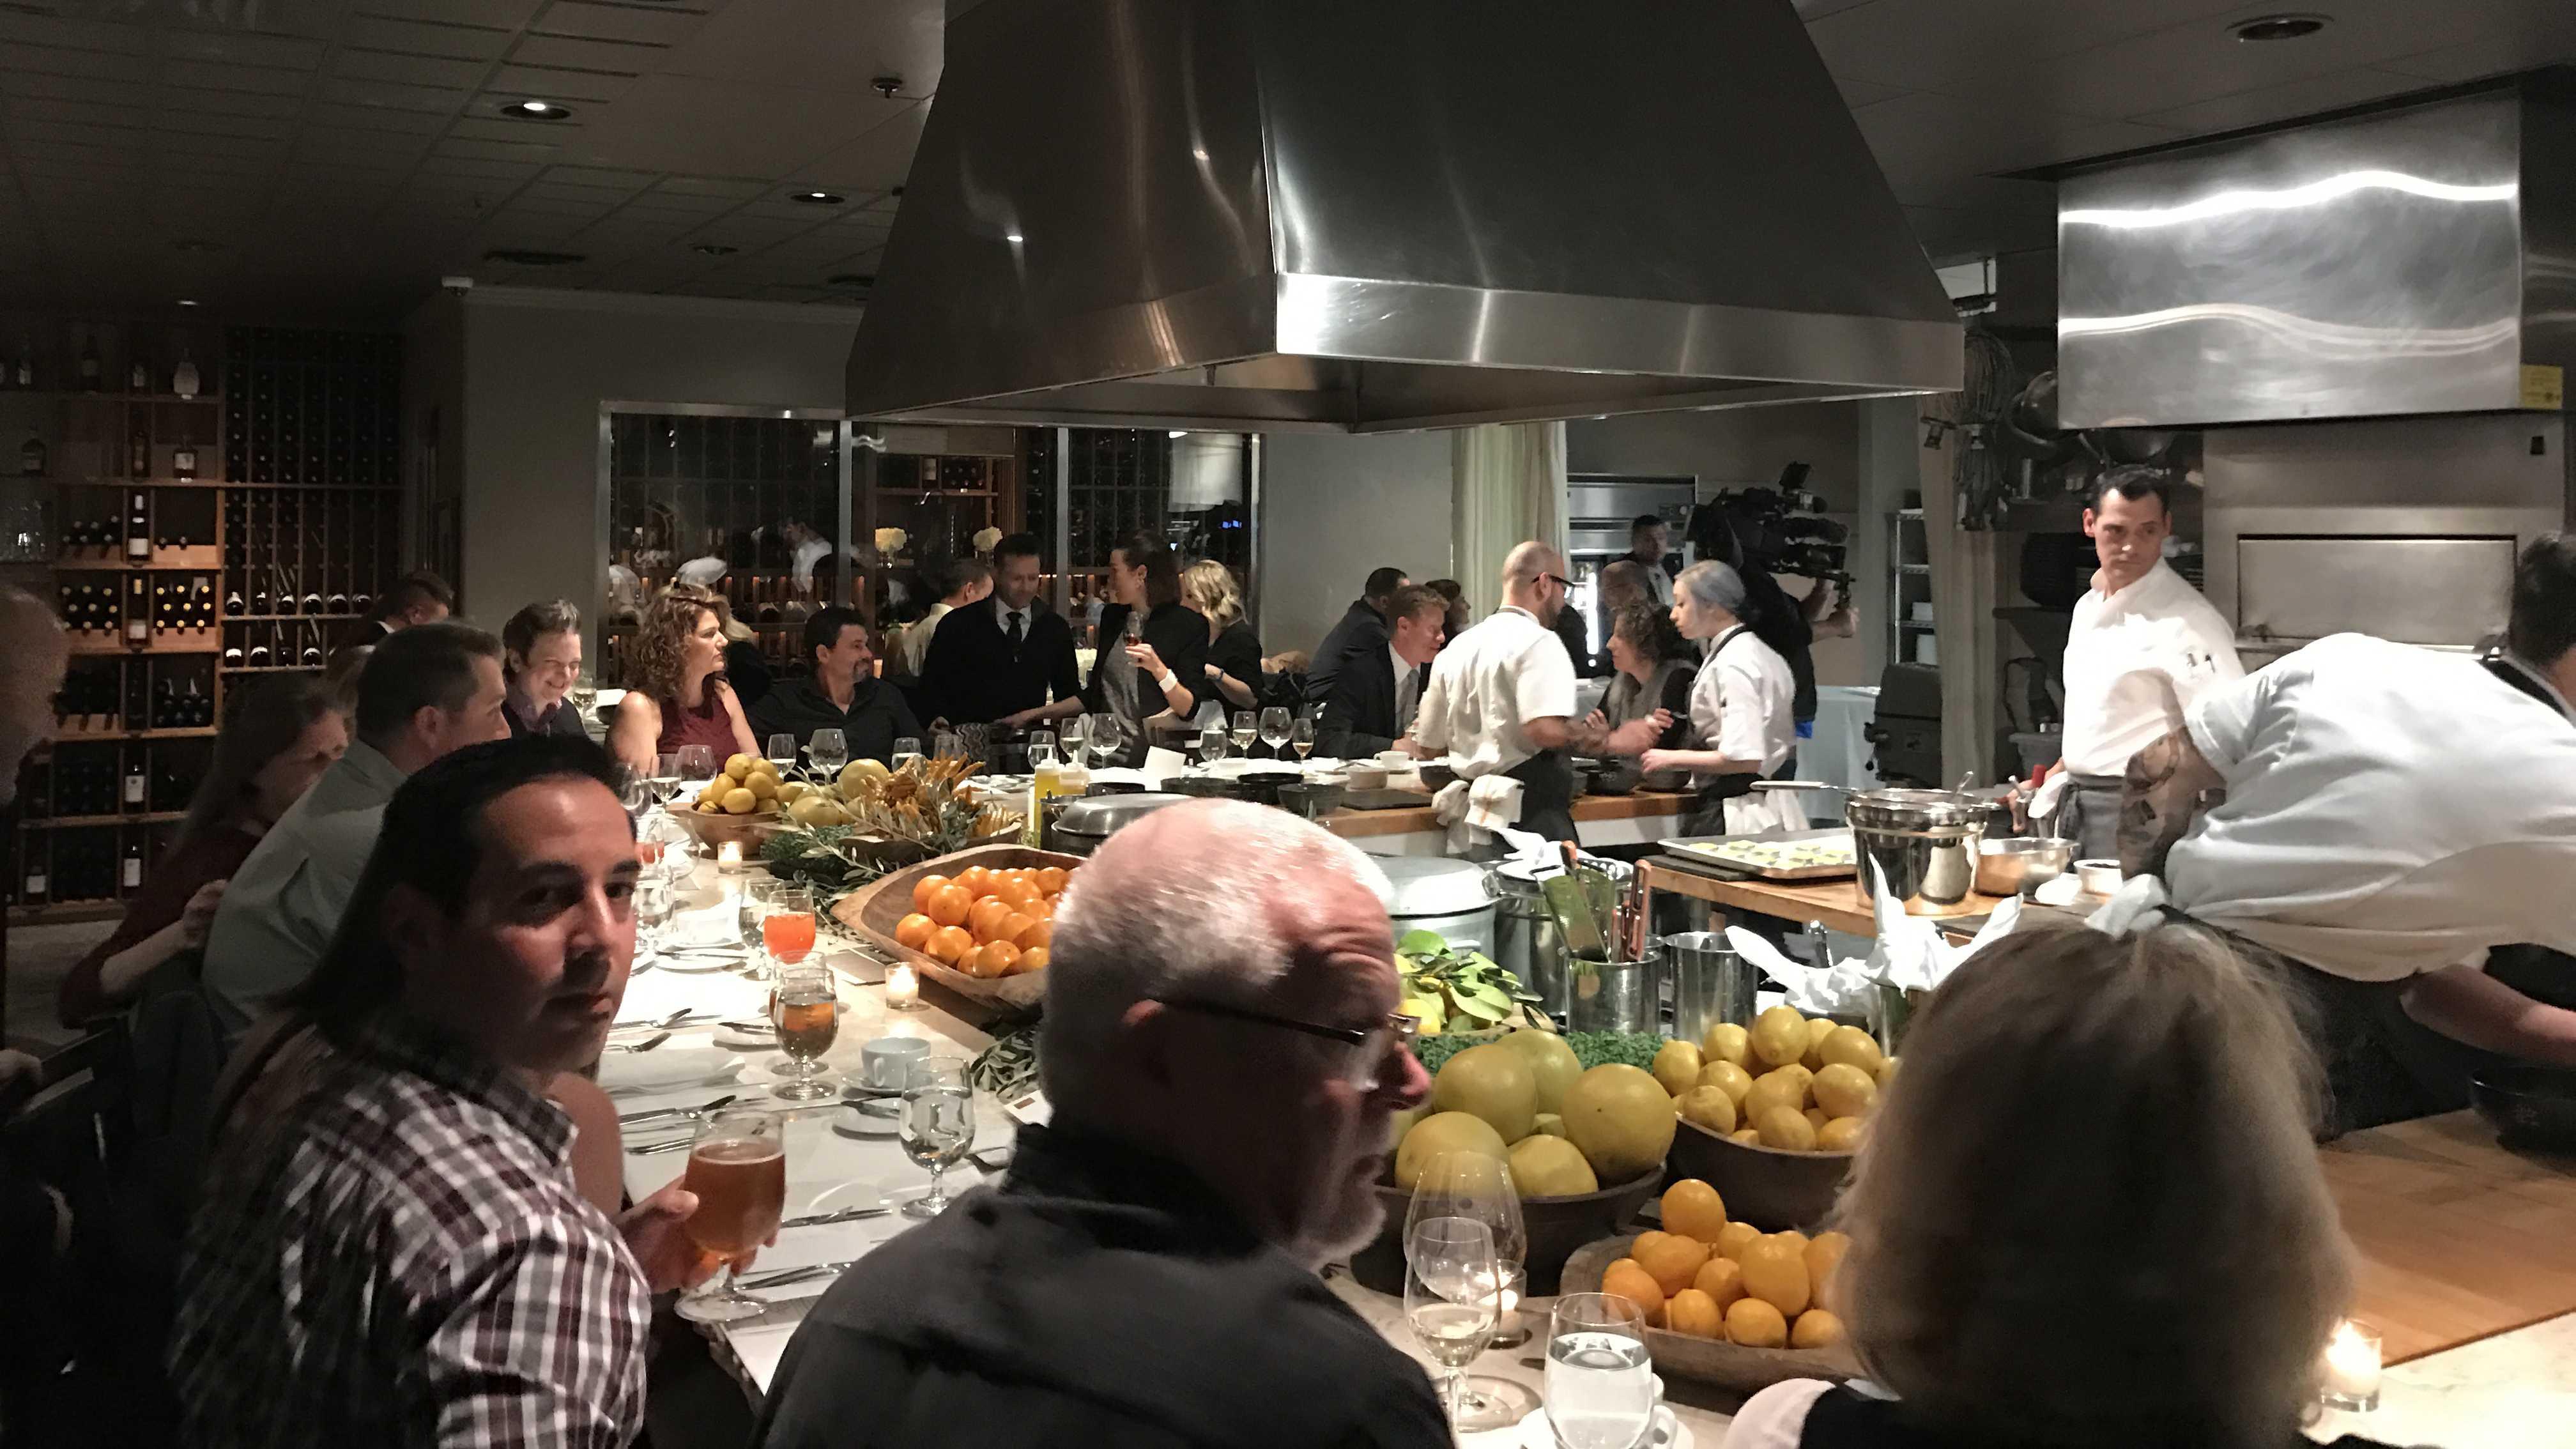 Kitchen makes AAA exclusive 2017 list